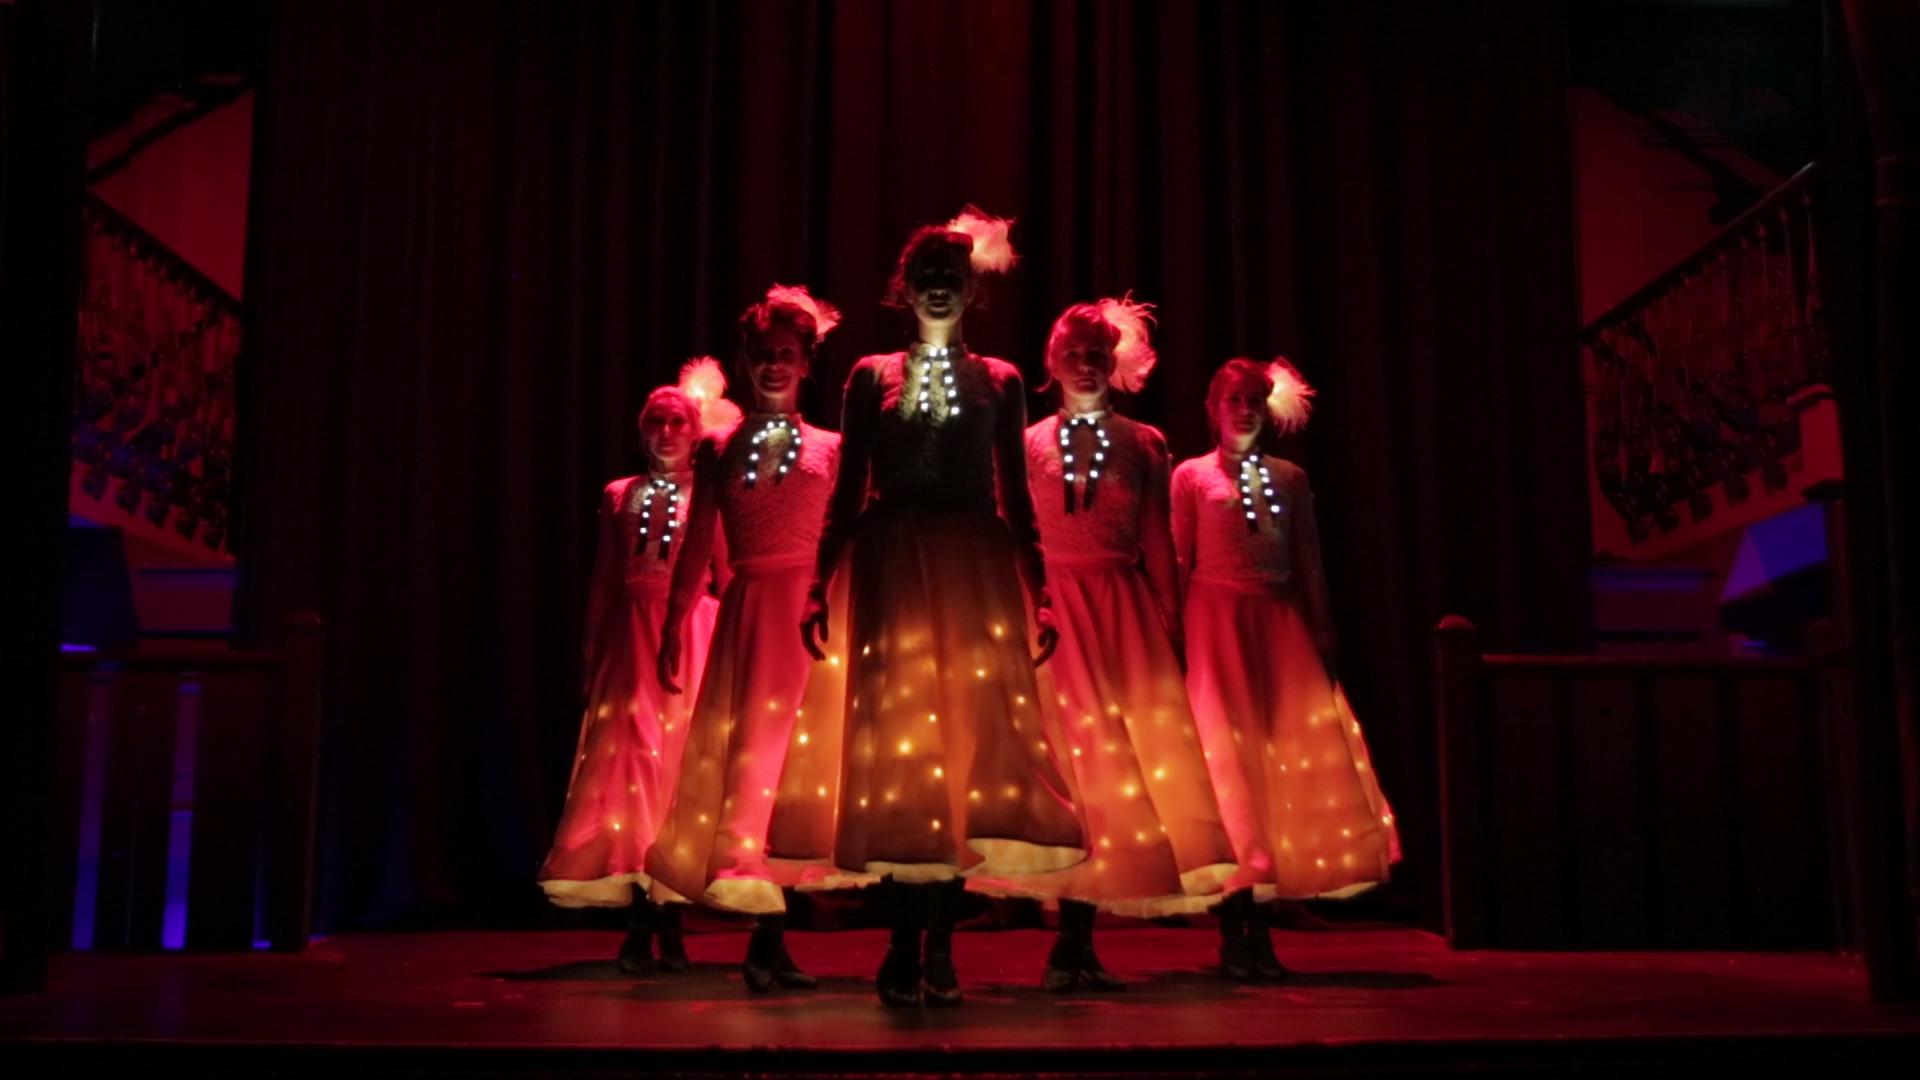 Glow dresses